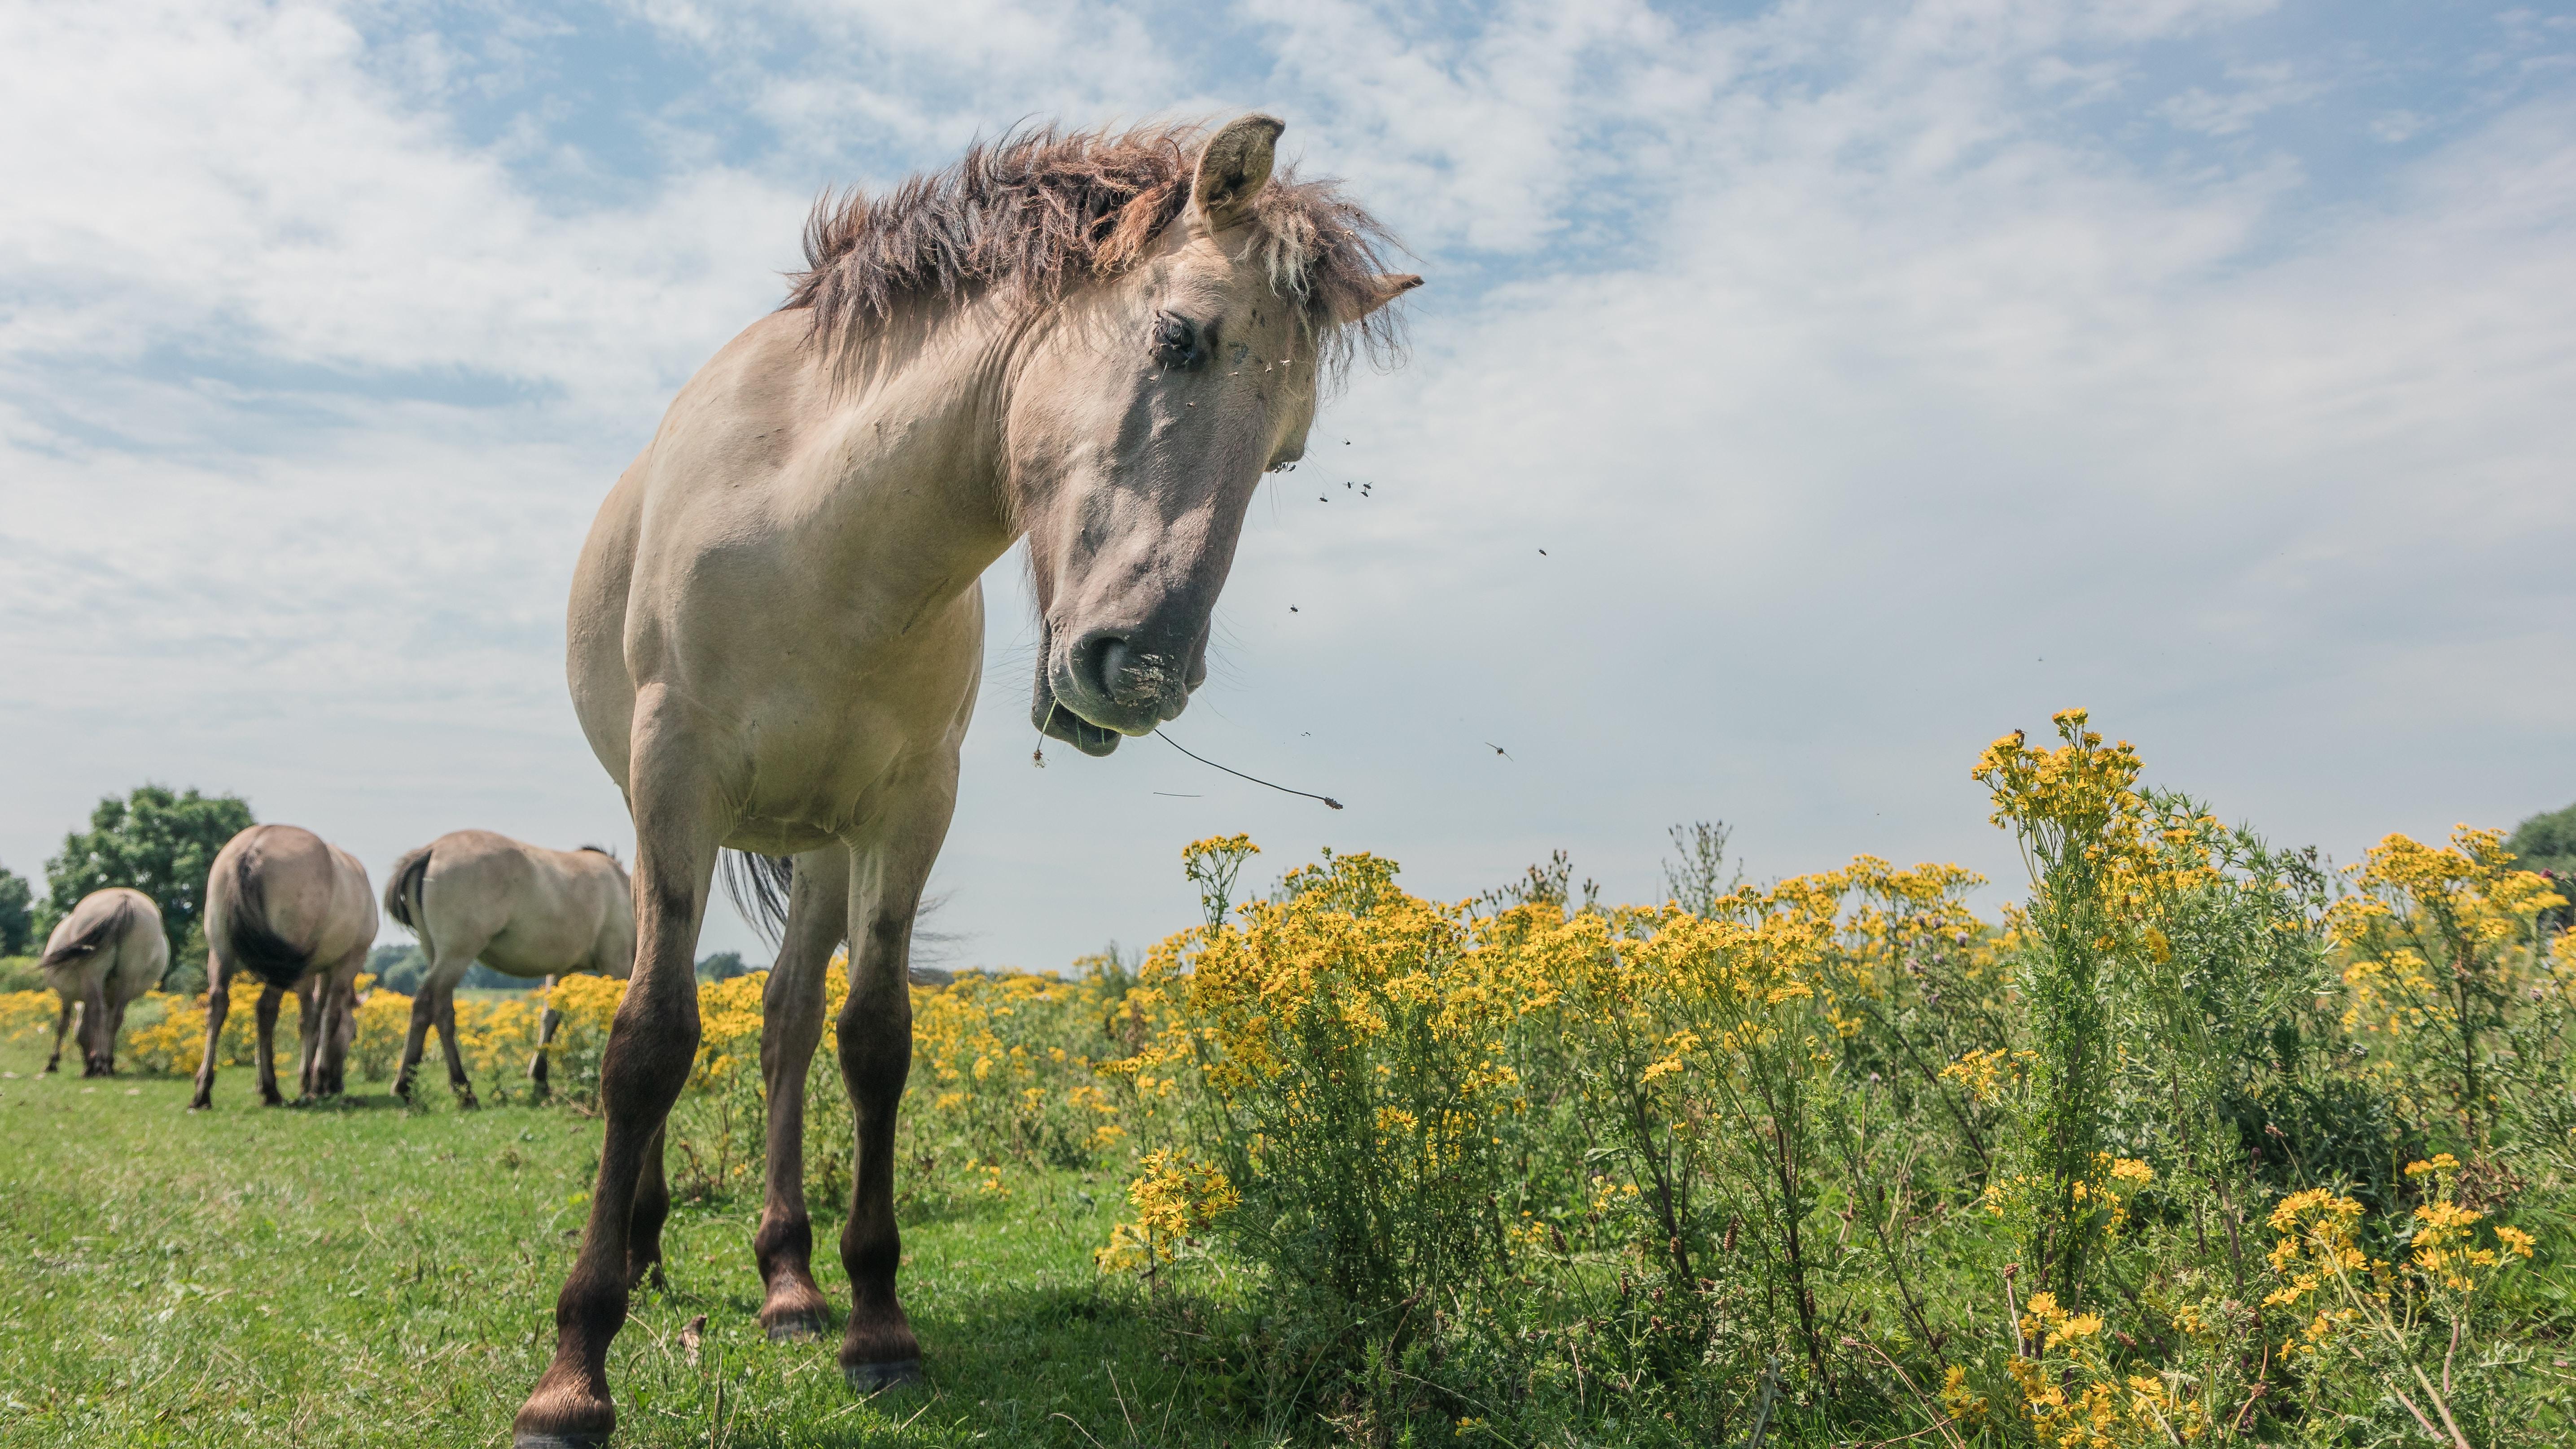 gray horse standing beside yellow flowers